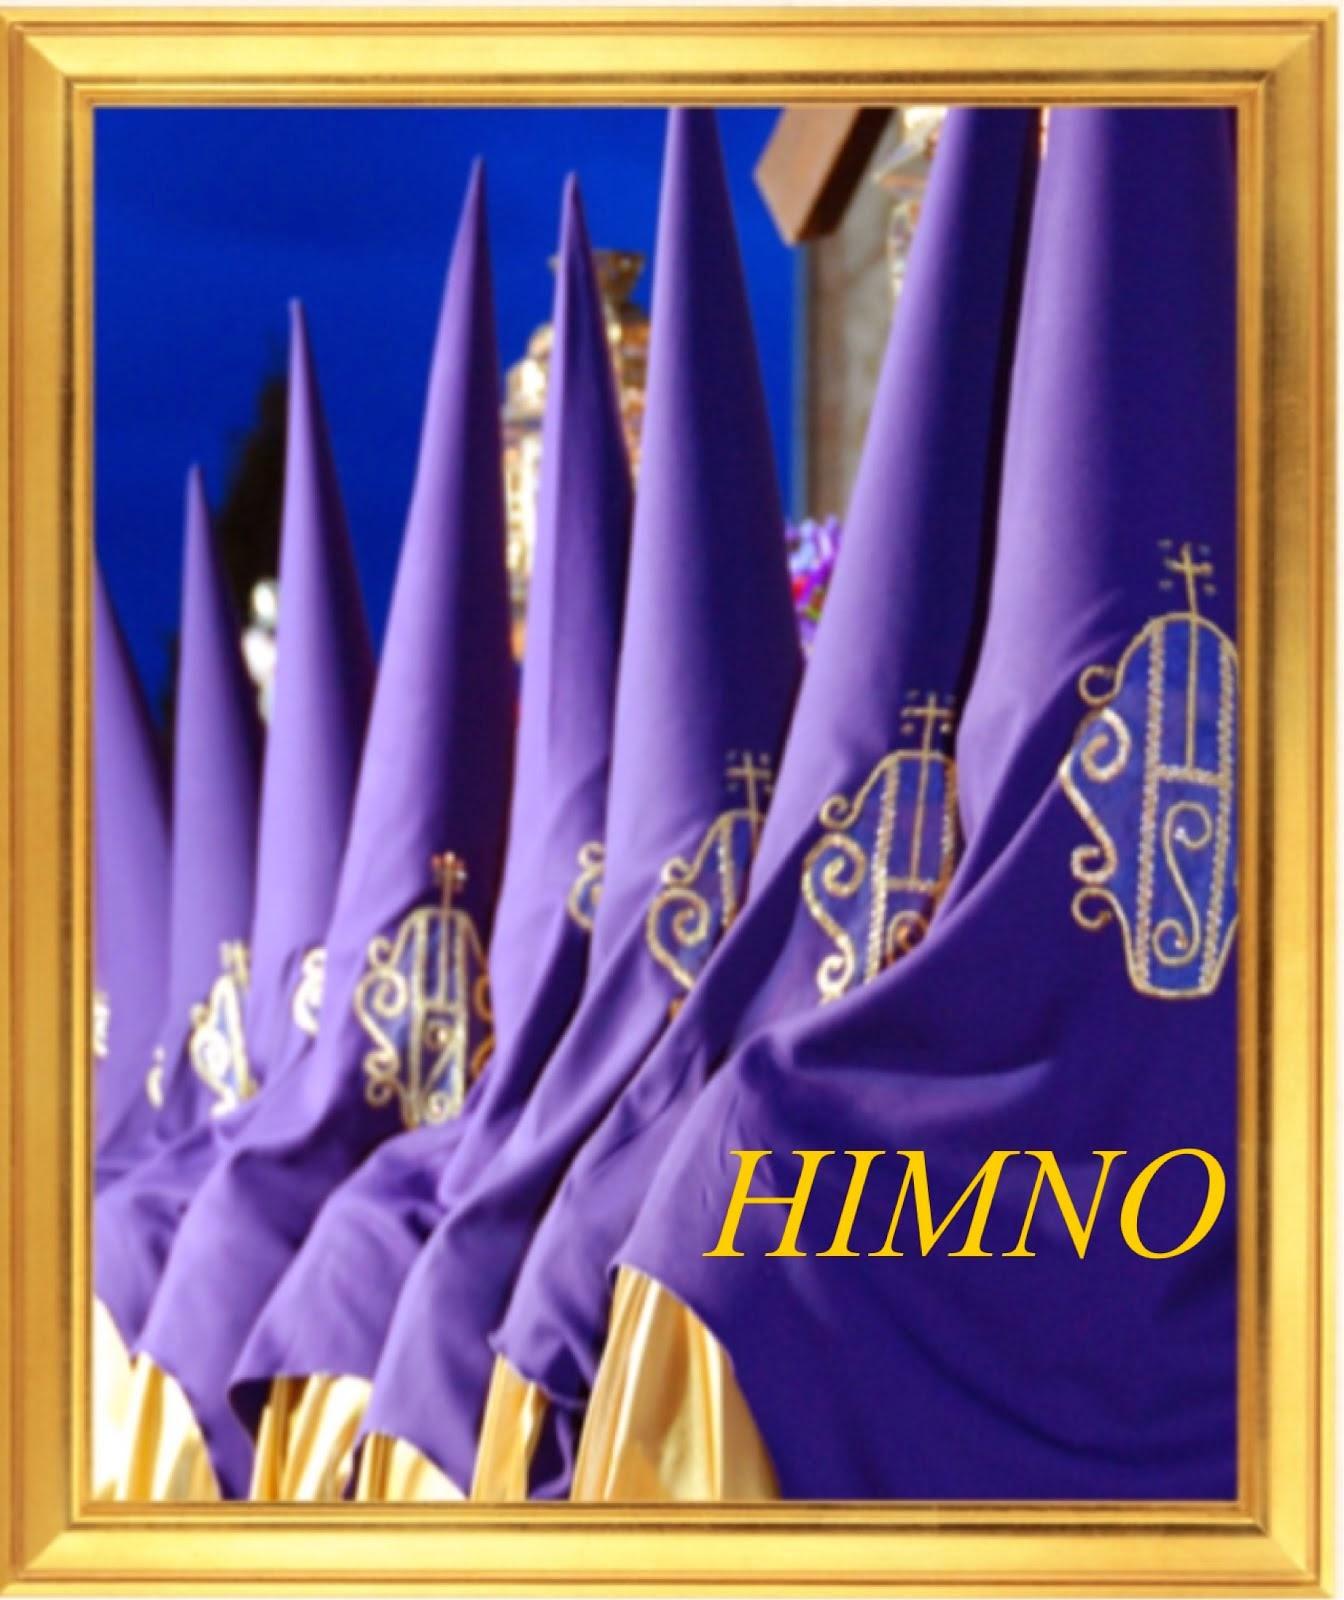 HIMNO HERMANDAD